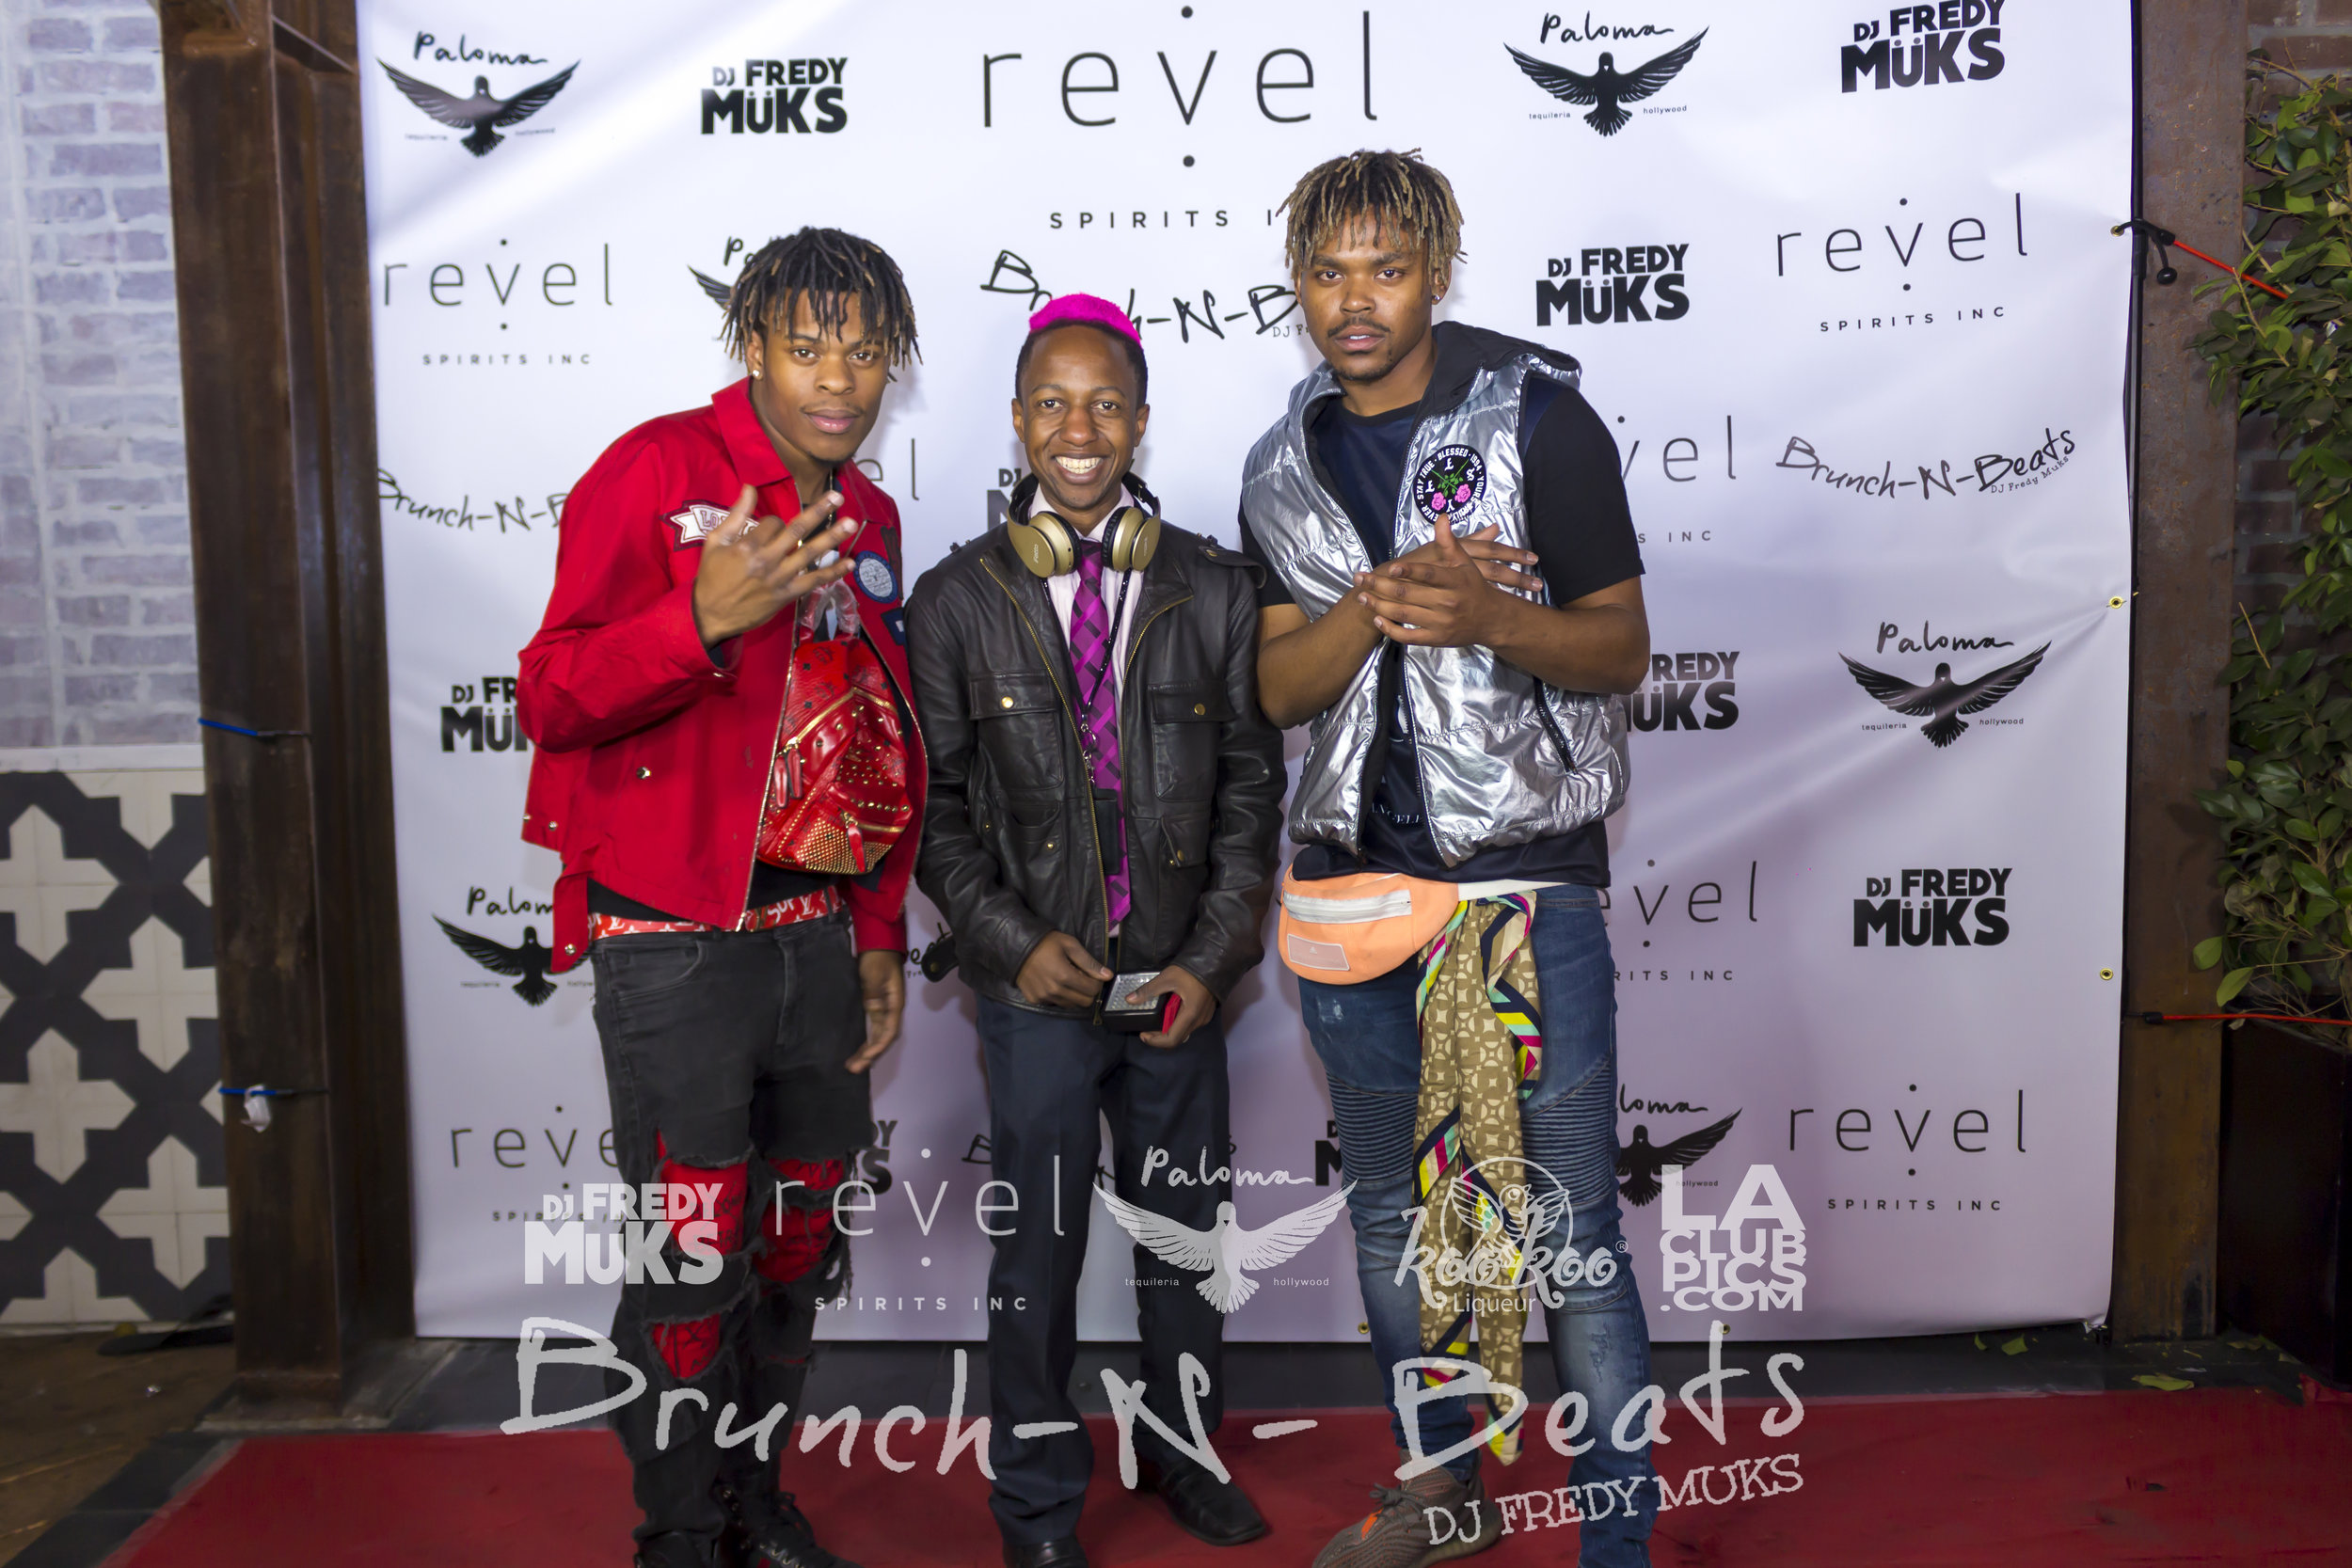 Brunch-N-Beats - Paloma Hollywood - 02-25-18_239.jpg